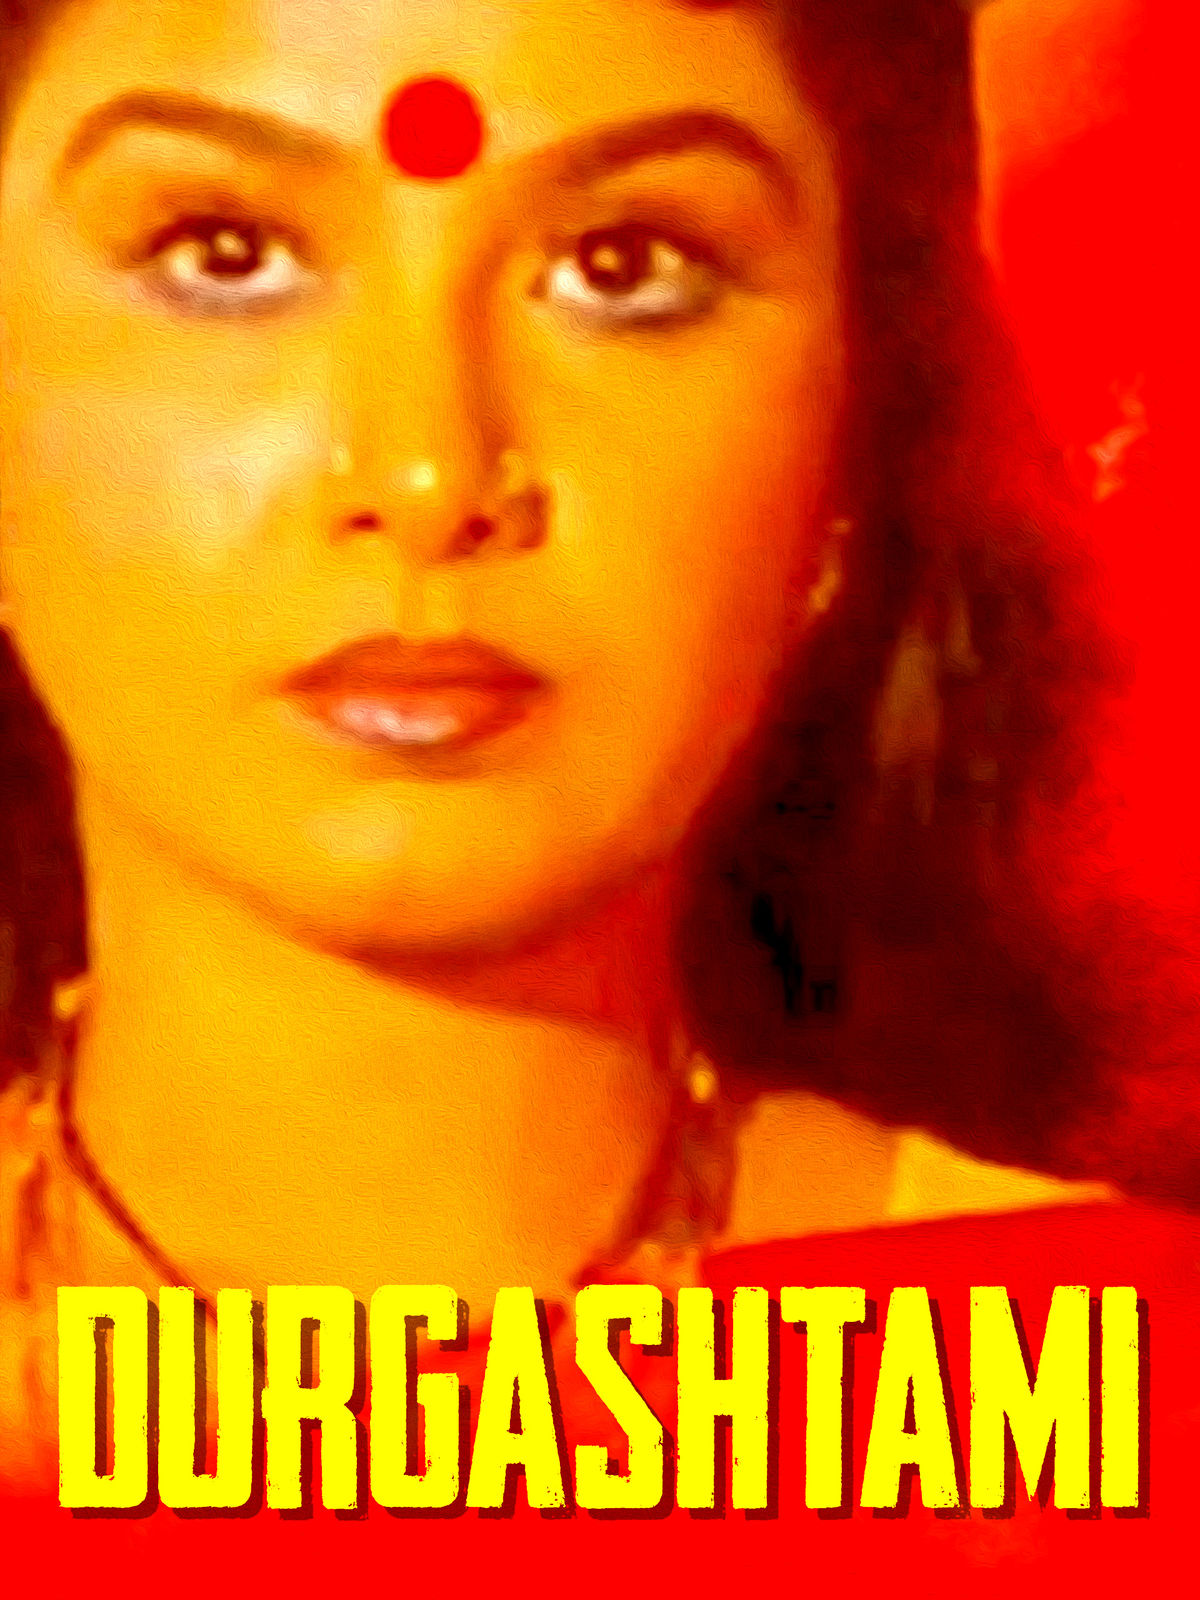 Vajramuni Best Movies, TV Shows and Web Series List